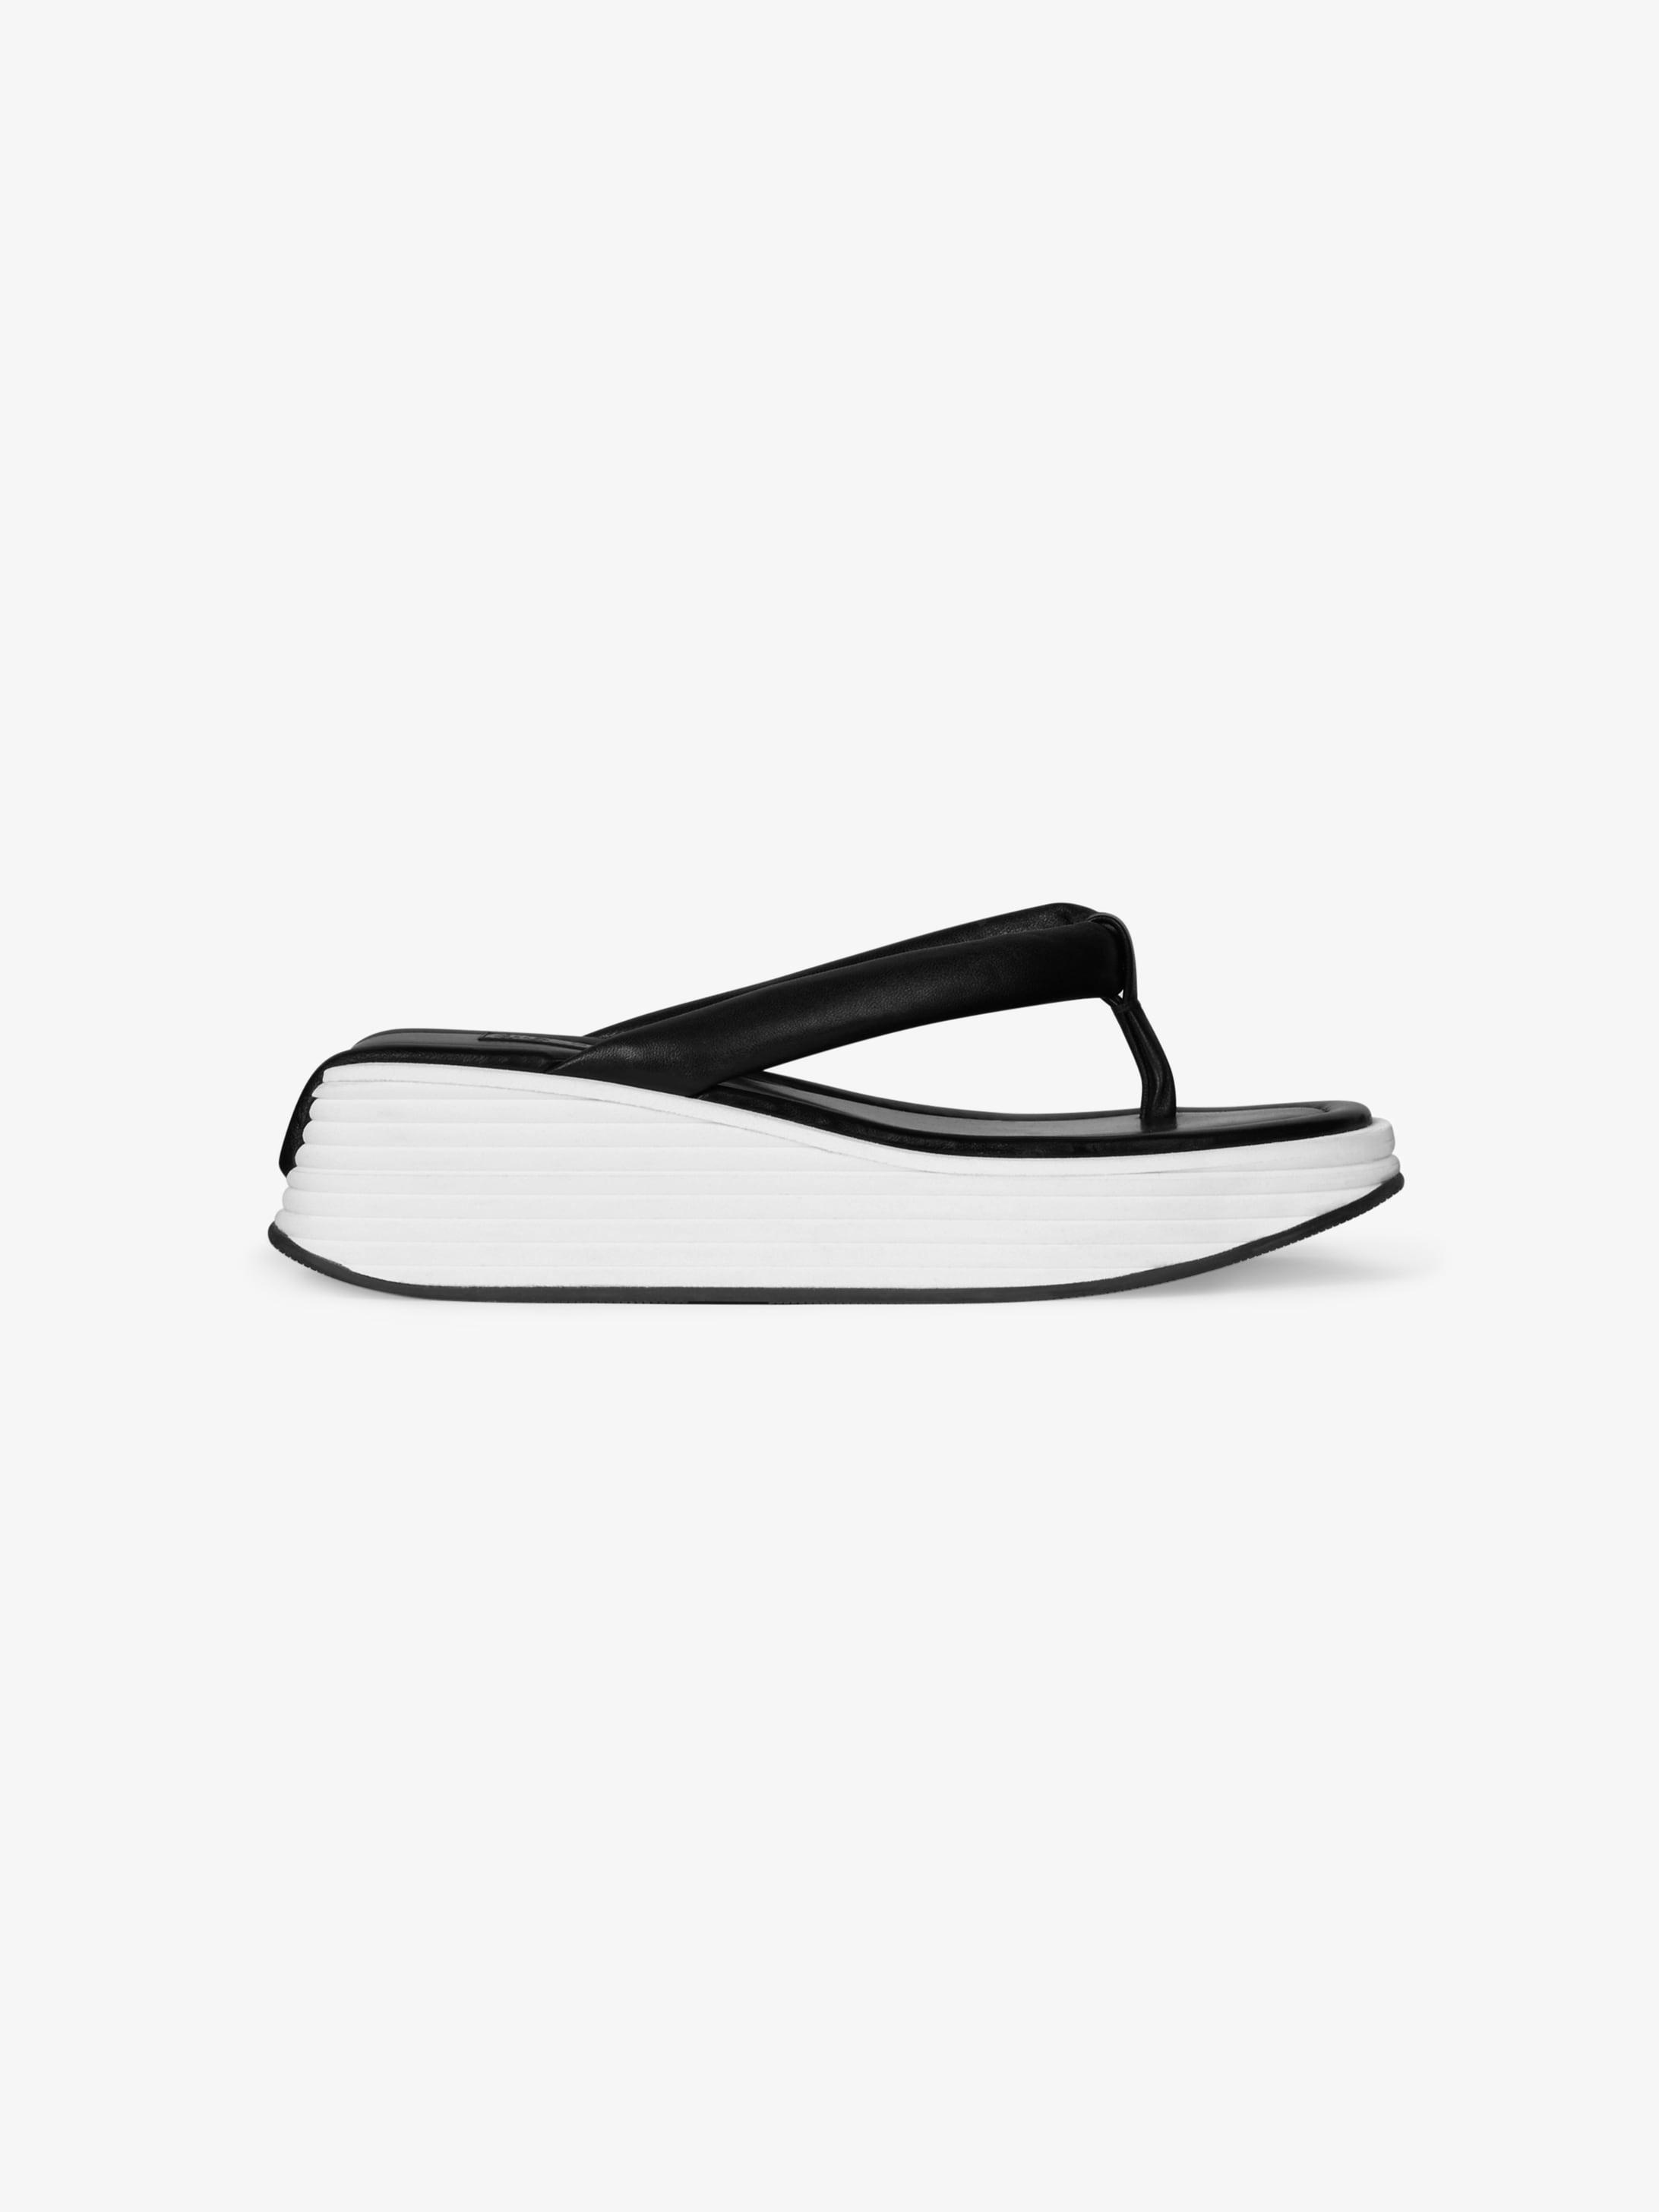 Kyoto platform sandals in leather